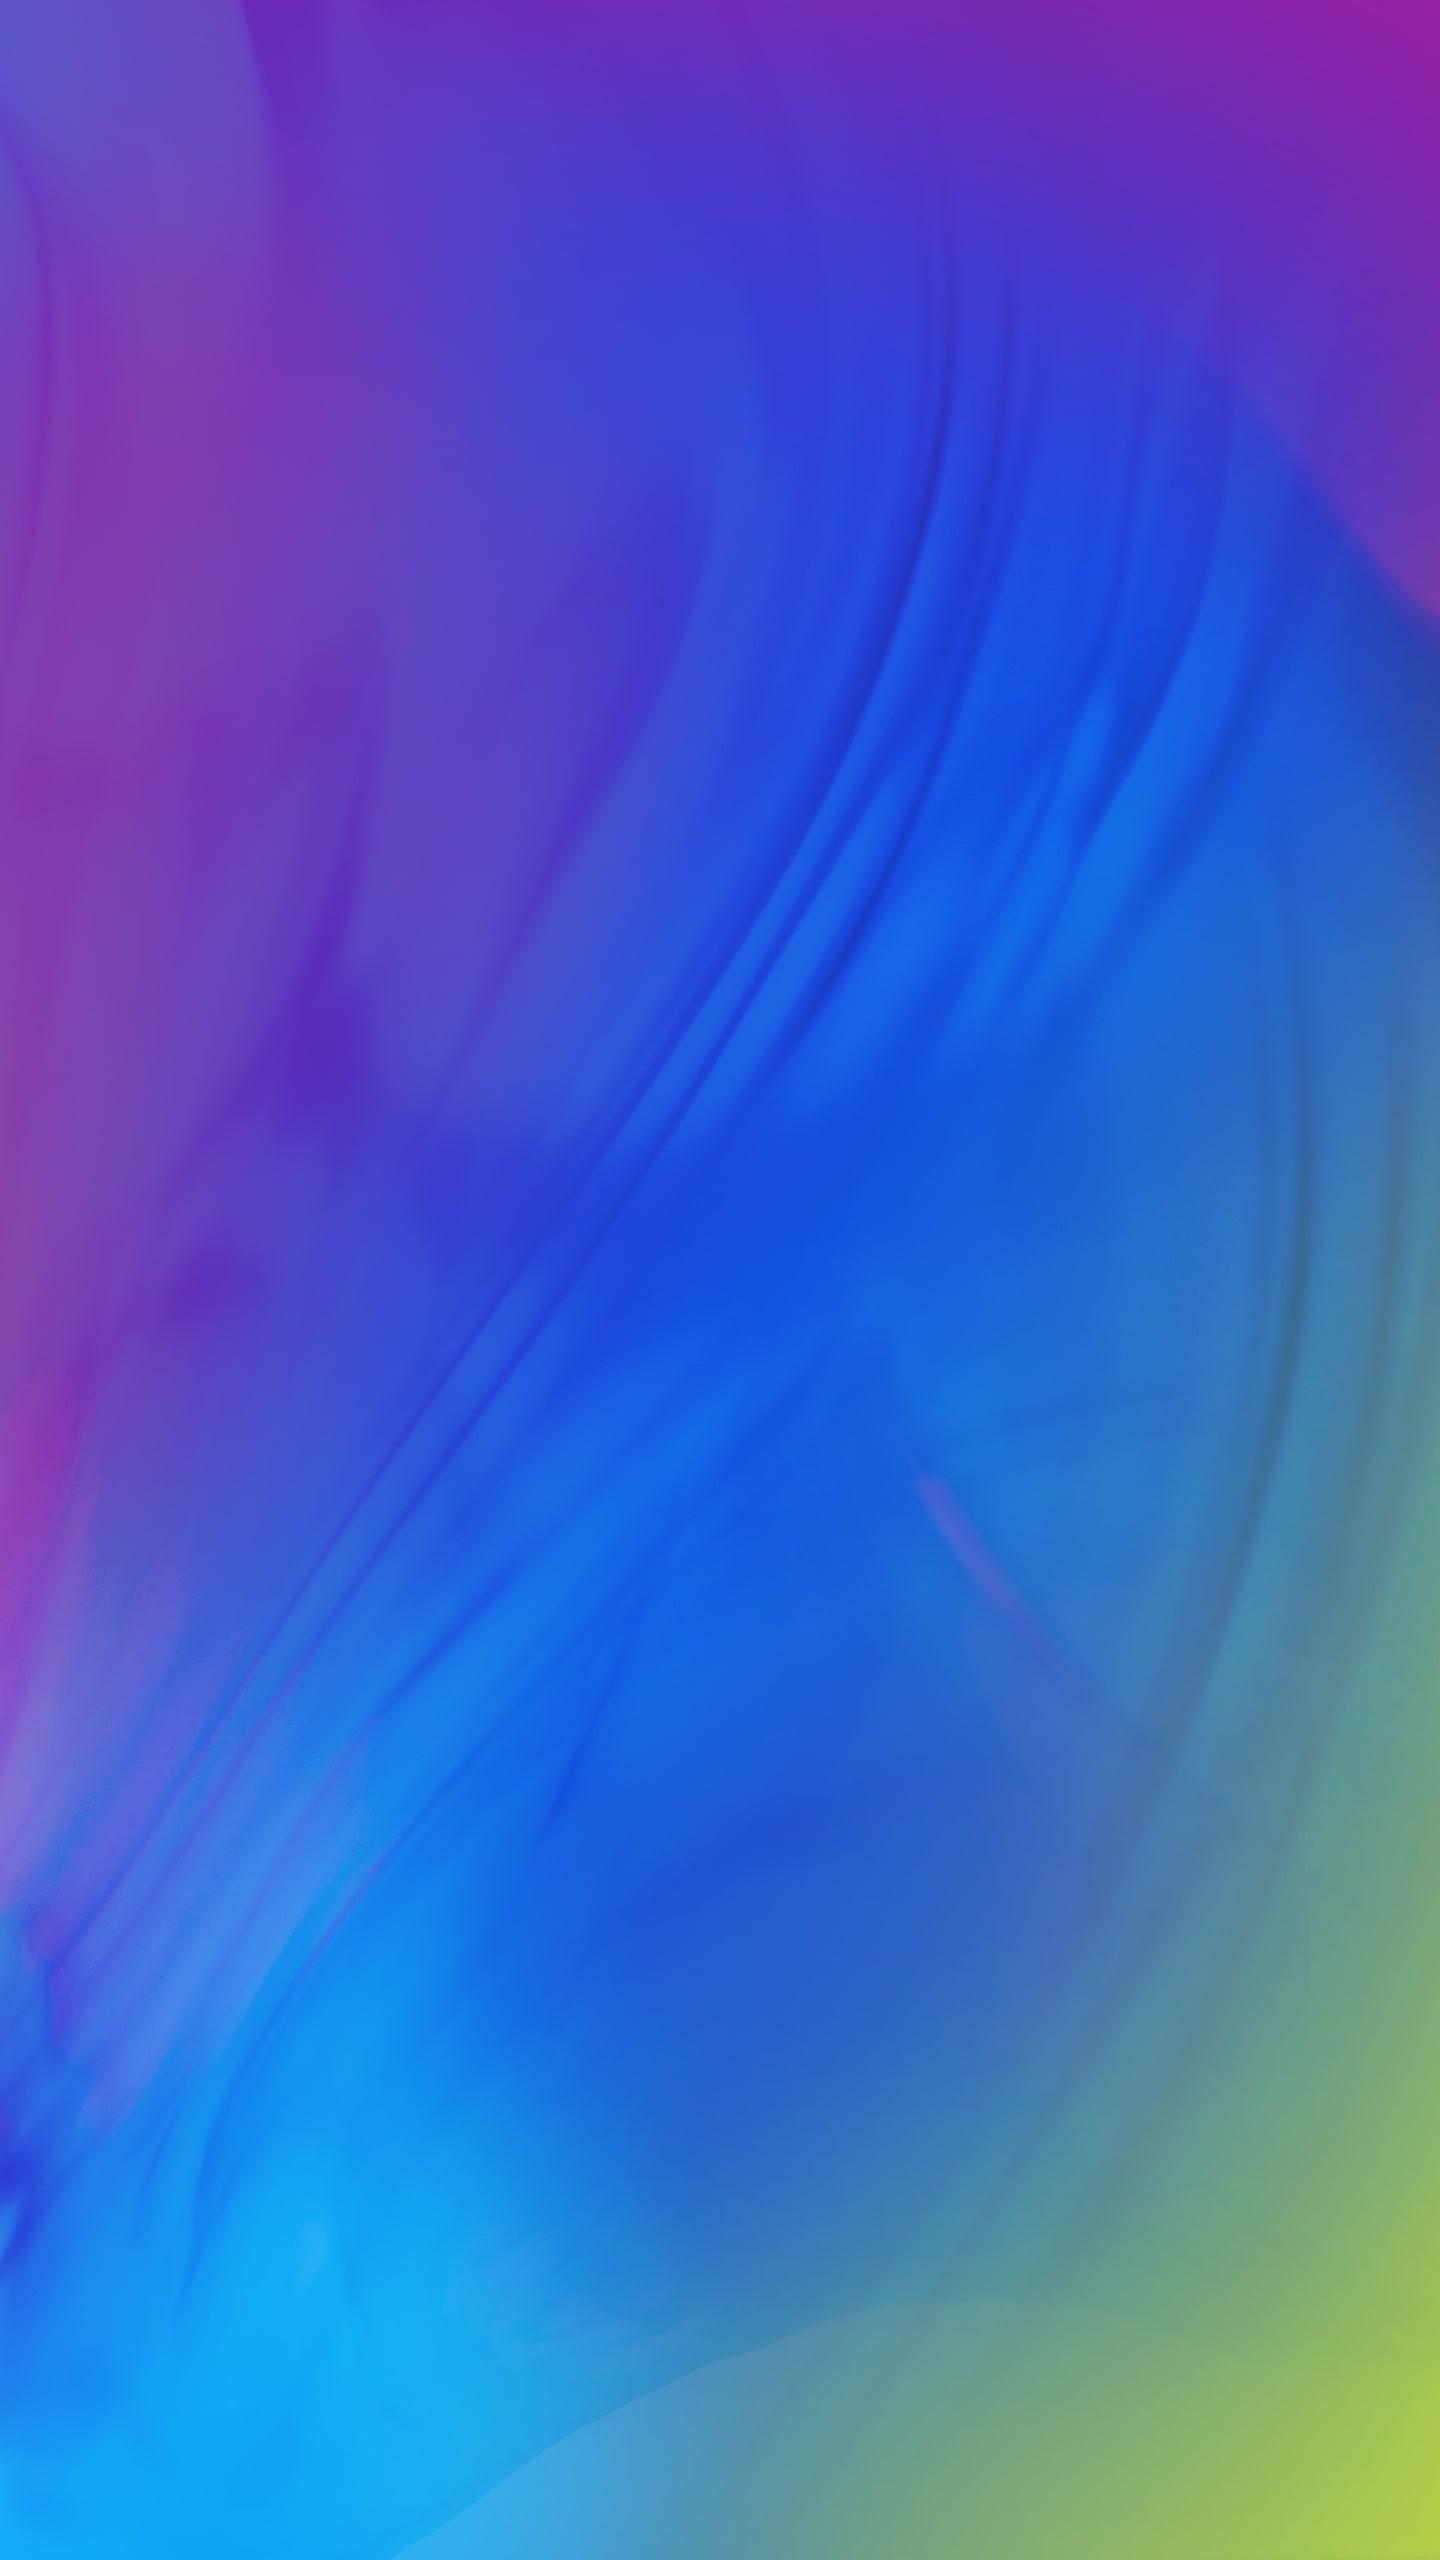 Wallpaper Samsung Galaxy M10 abstract colorful HD OS 21447 1440x2560